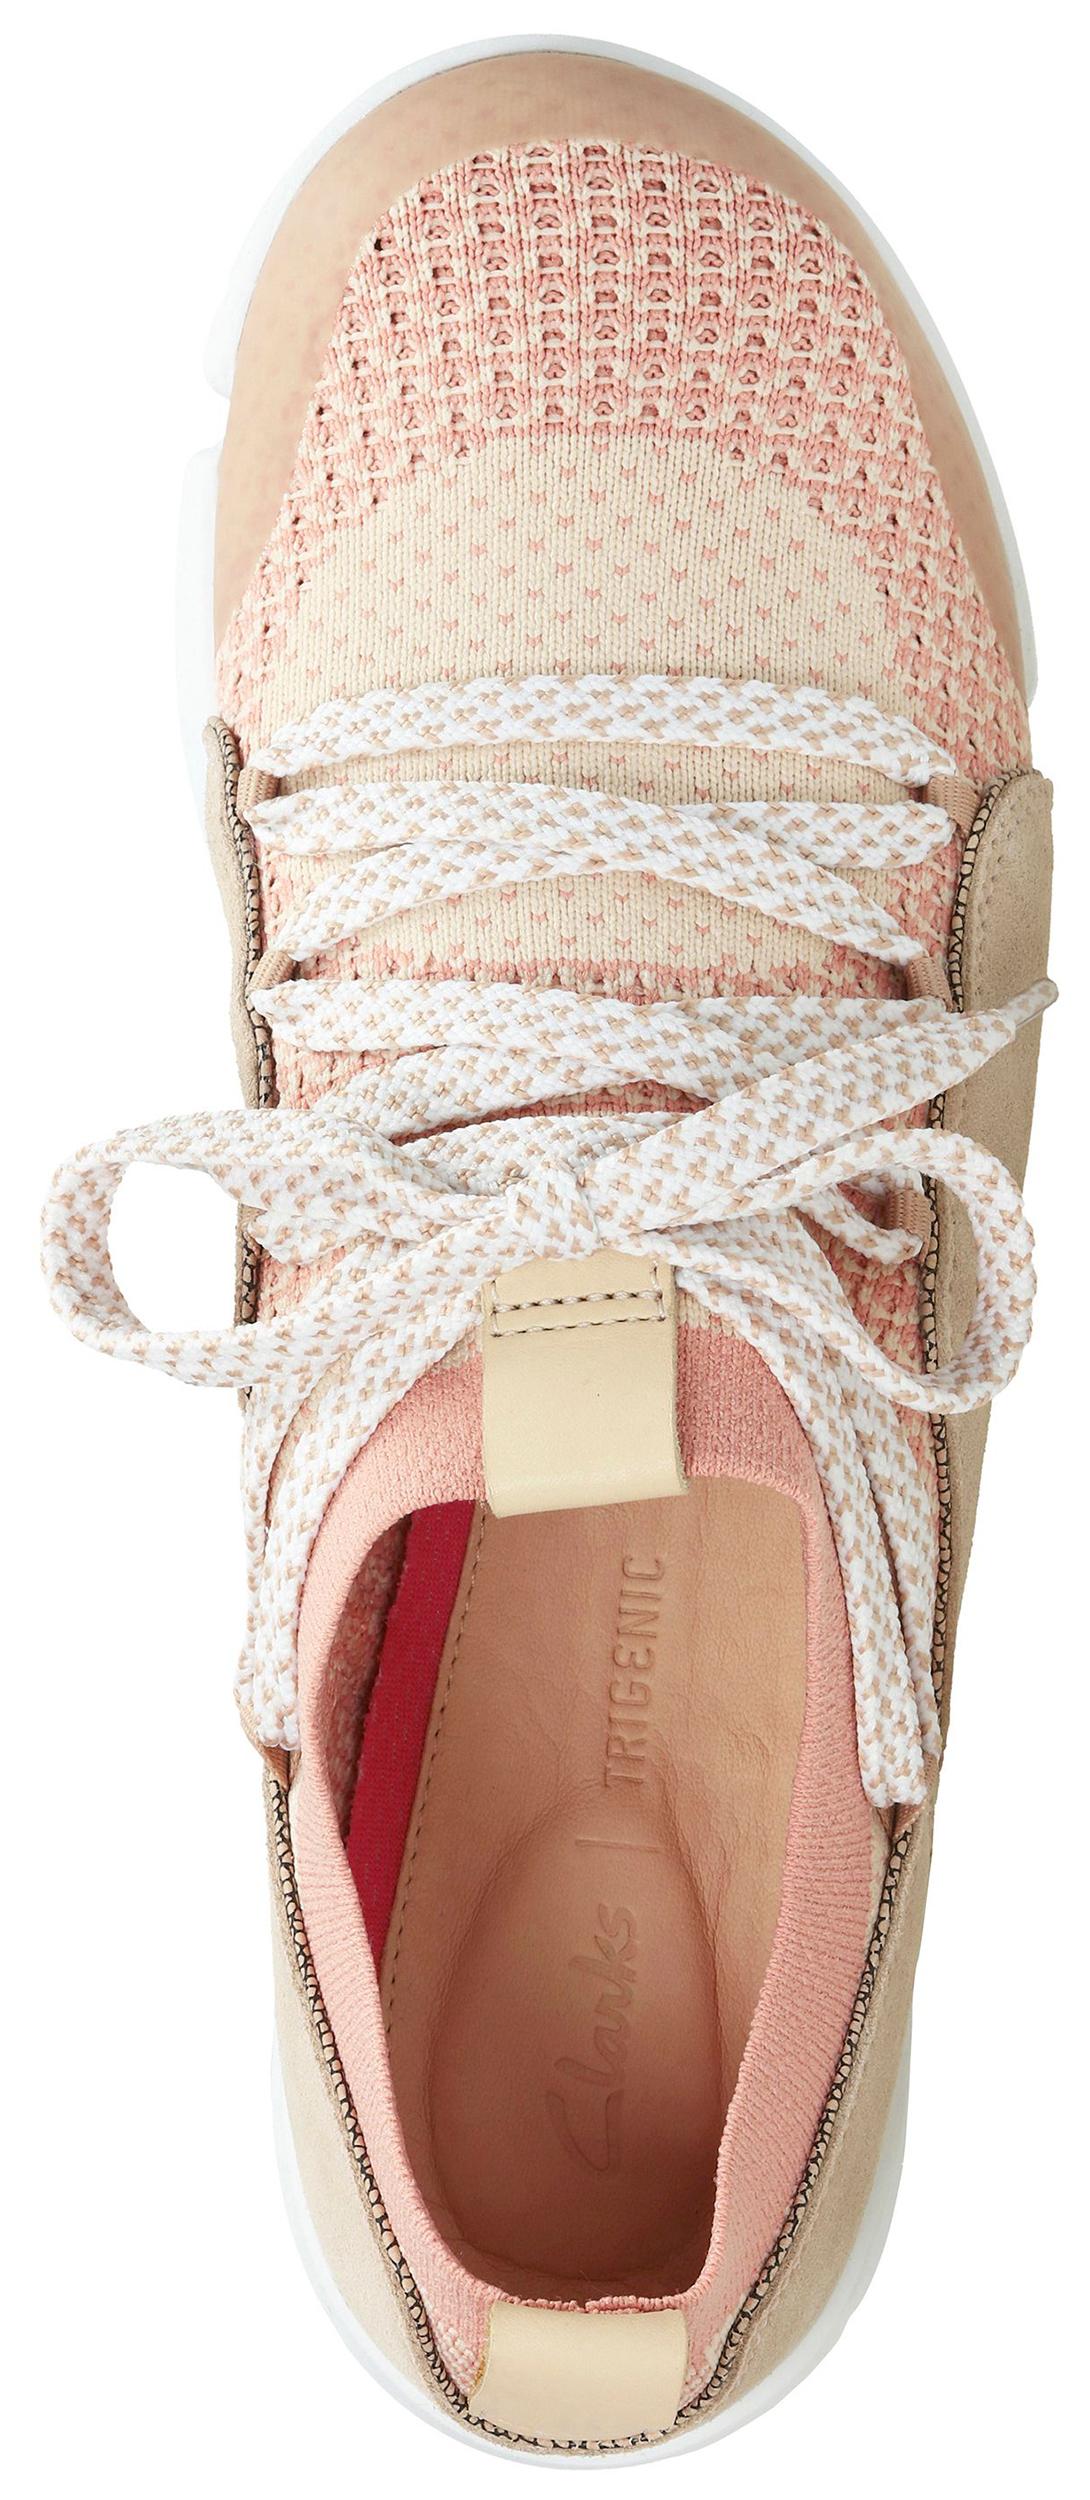 Chaussures Tri Amelia Clarks De Femmes mwNn0v8